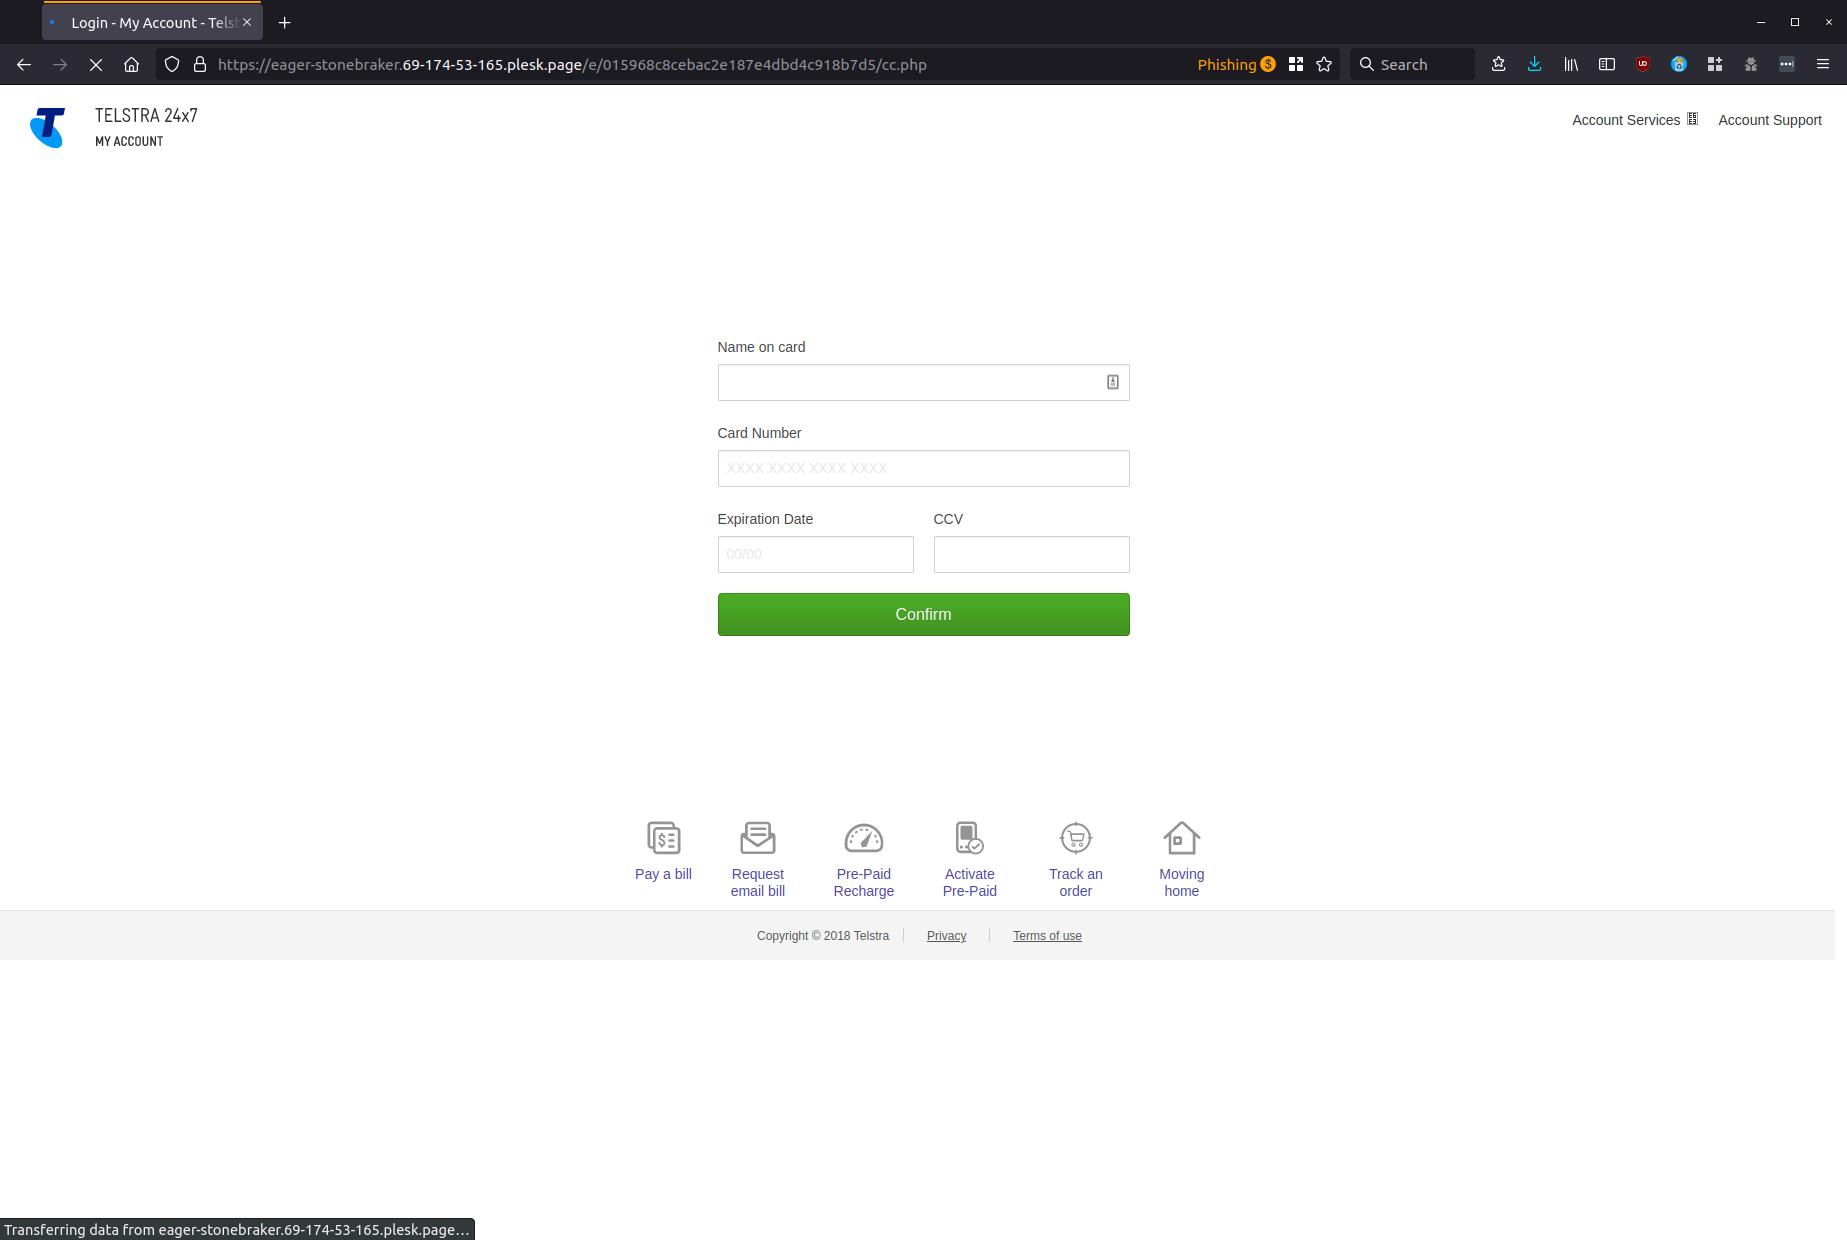 Login - My Account - Telstra — Mozilla Firefox_643